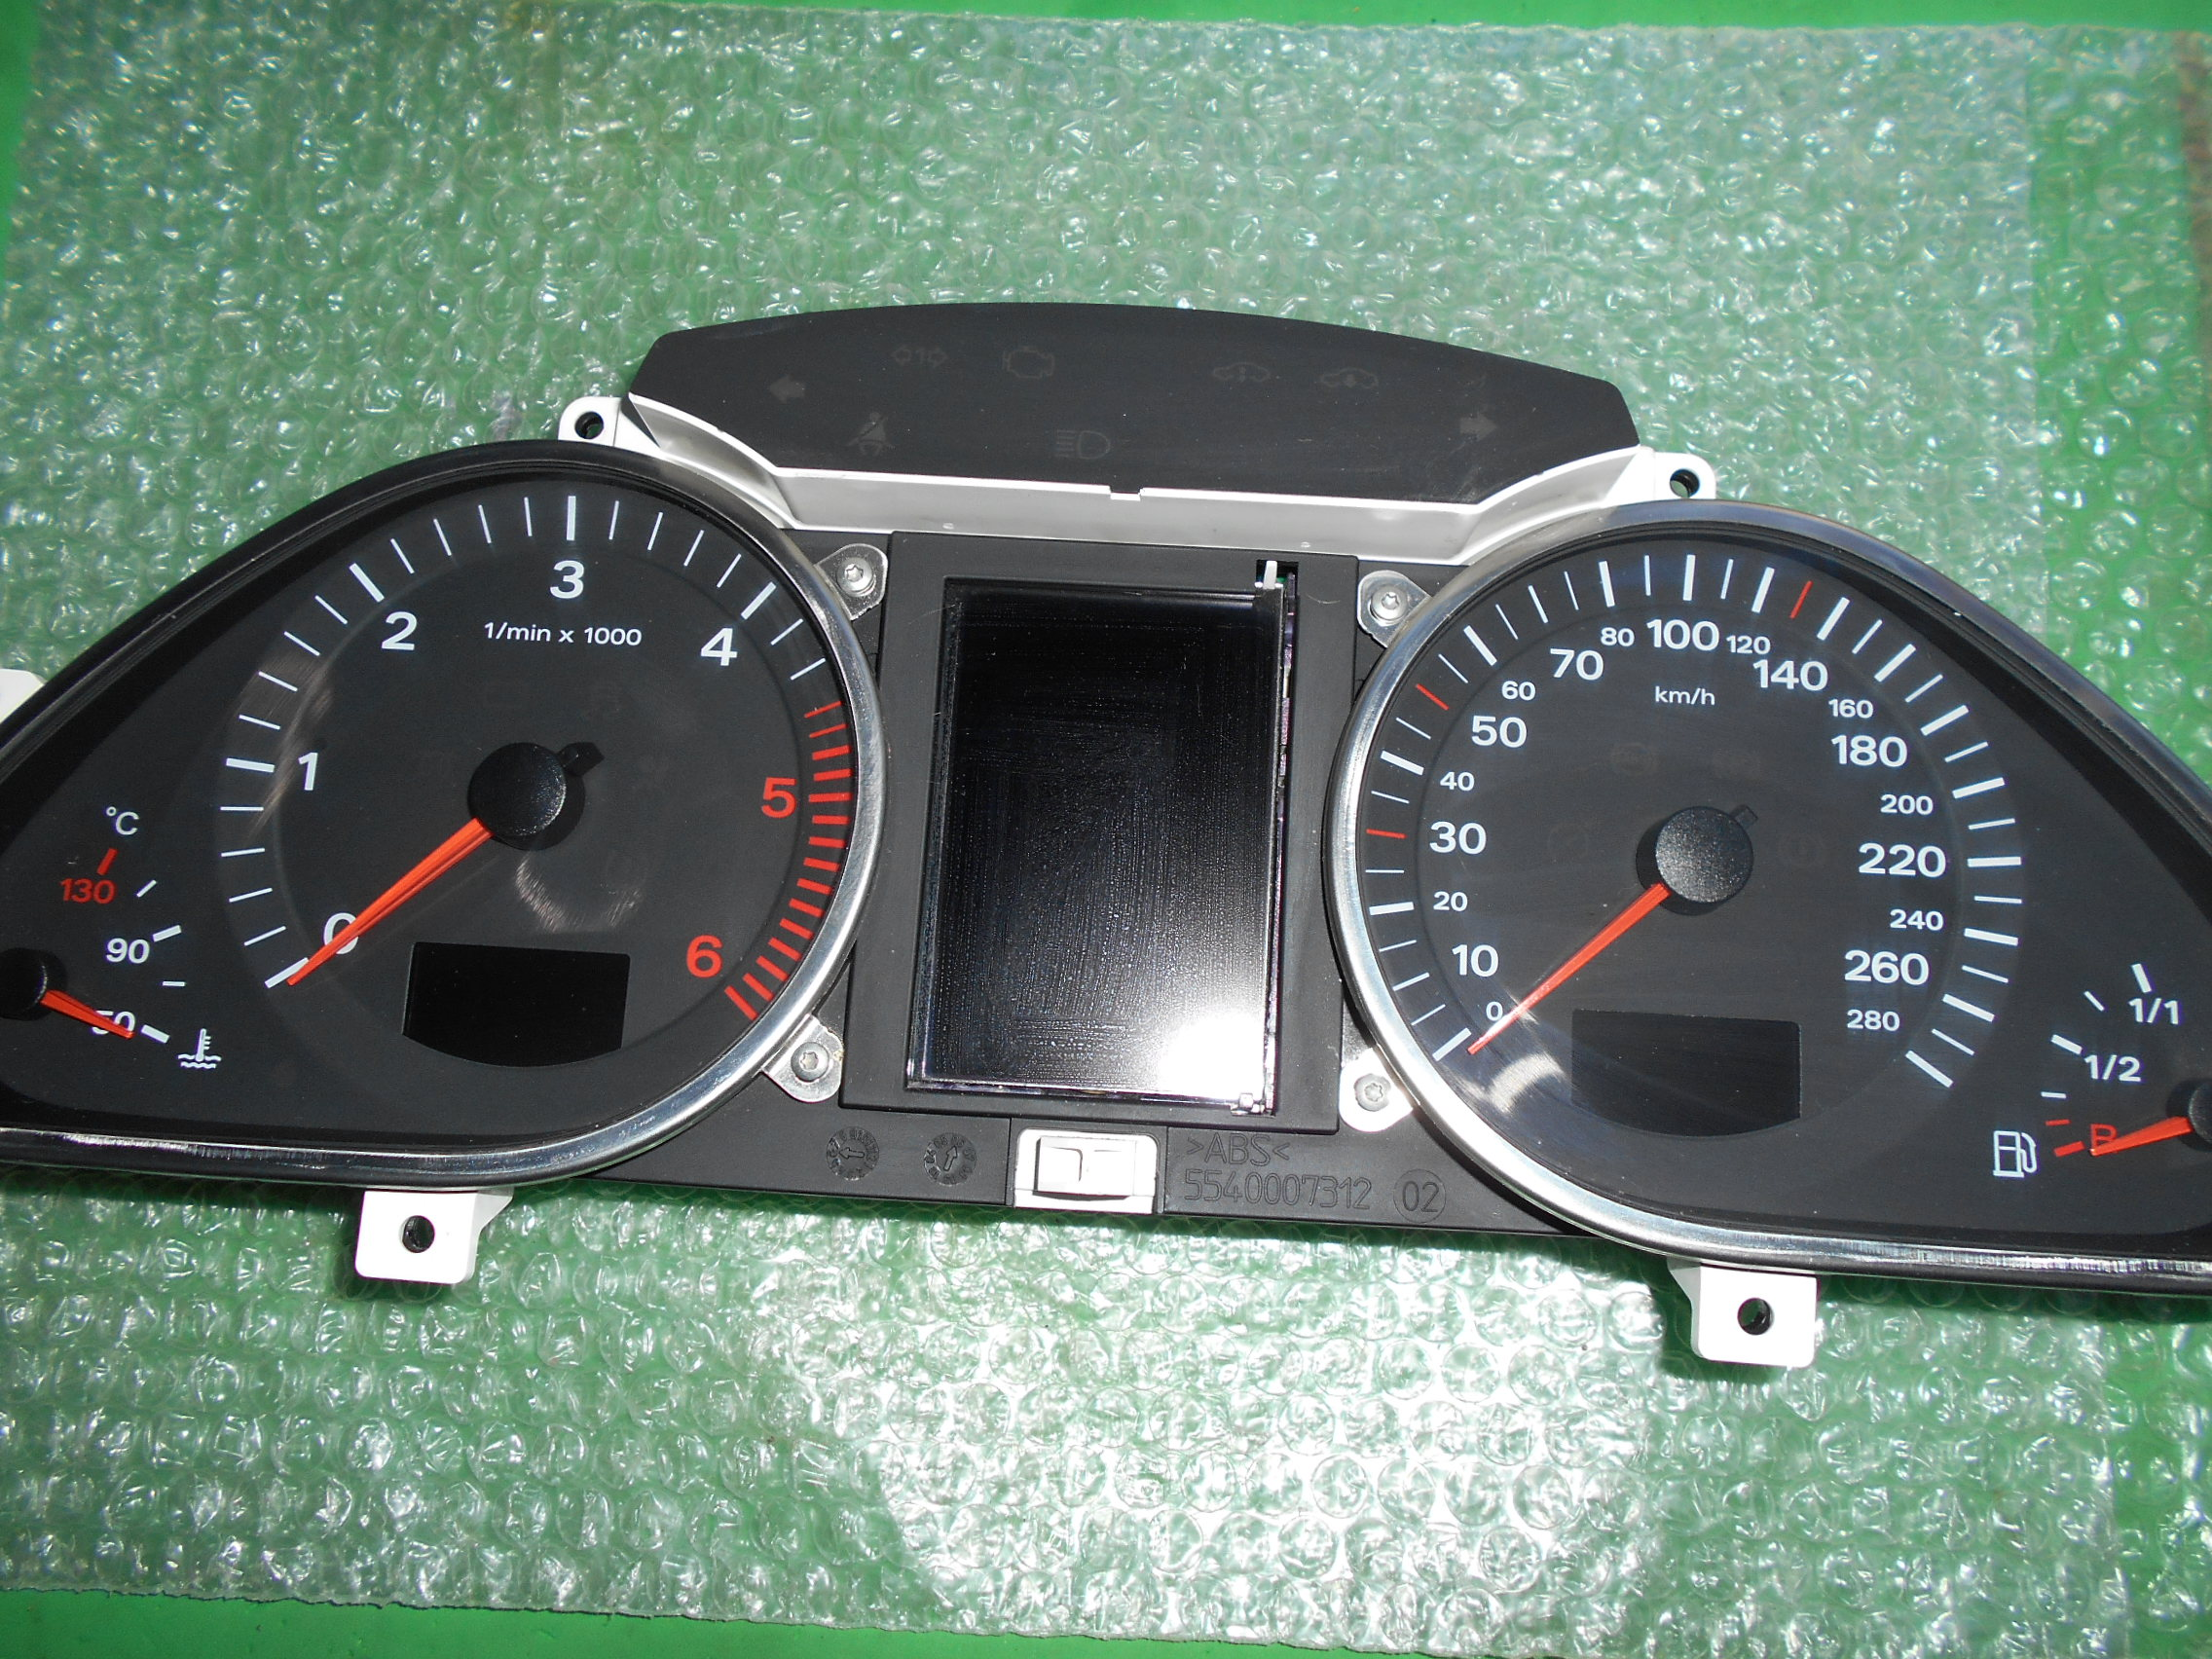 CUADRO DE INSTRUMENTOS 4L0920930B – MAGNETI MARELLI 5550007301 AUDI Q7 3.0 TDI V6 (4L)(2005-2009)